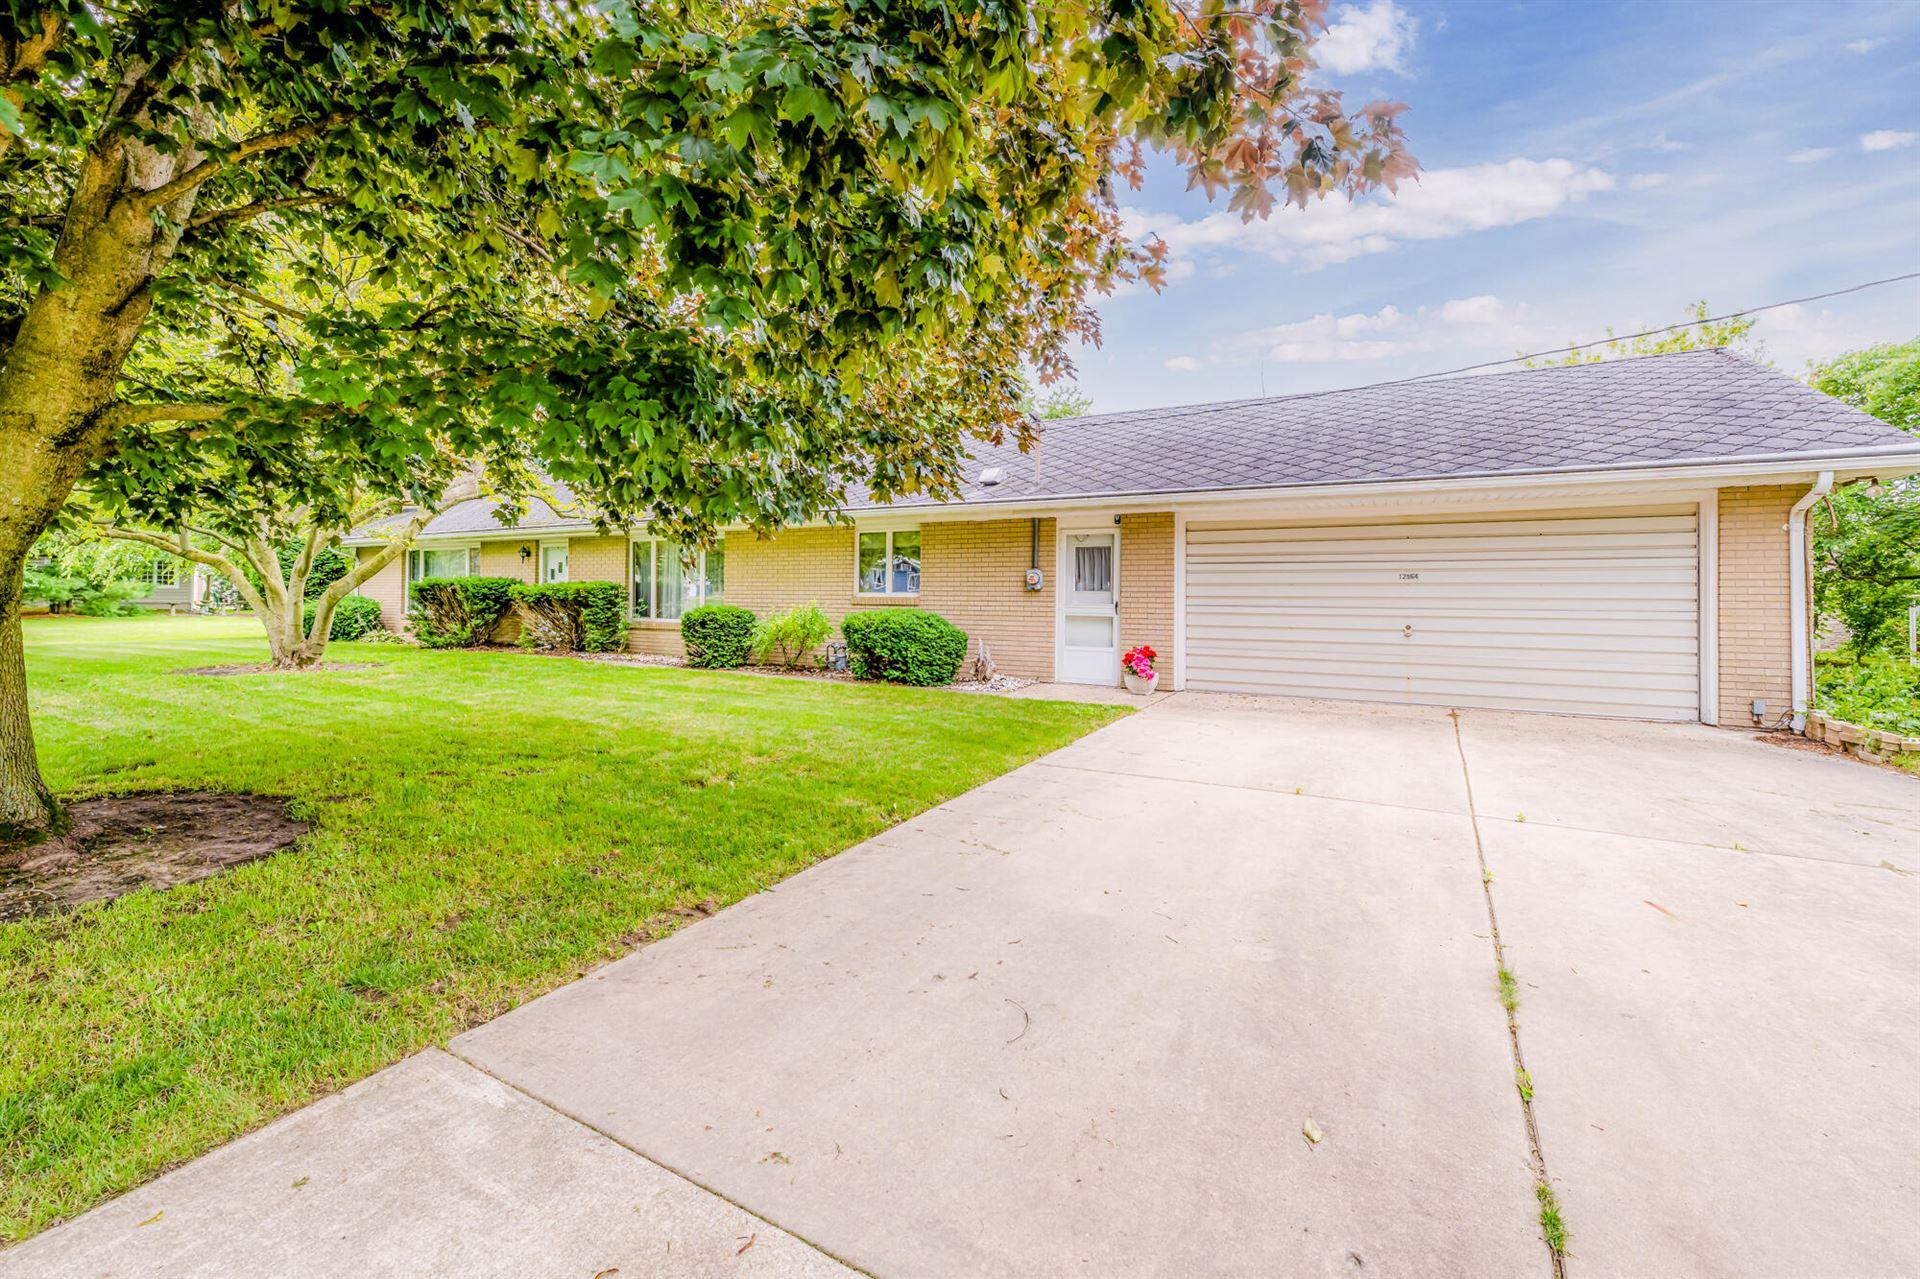 12964 Peck Avenue, Sawyer, MI 49125 - MLS#: 21026883